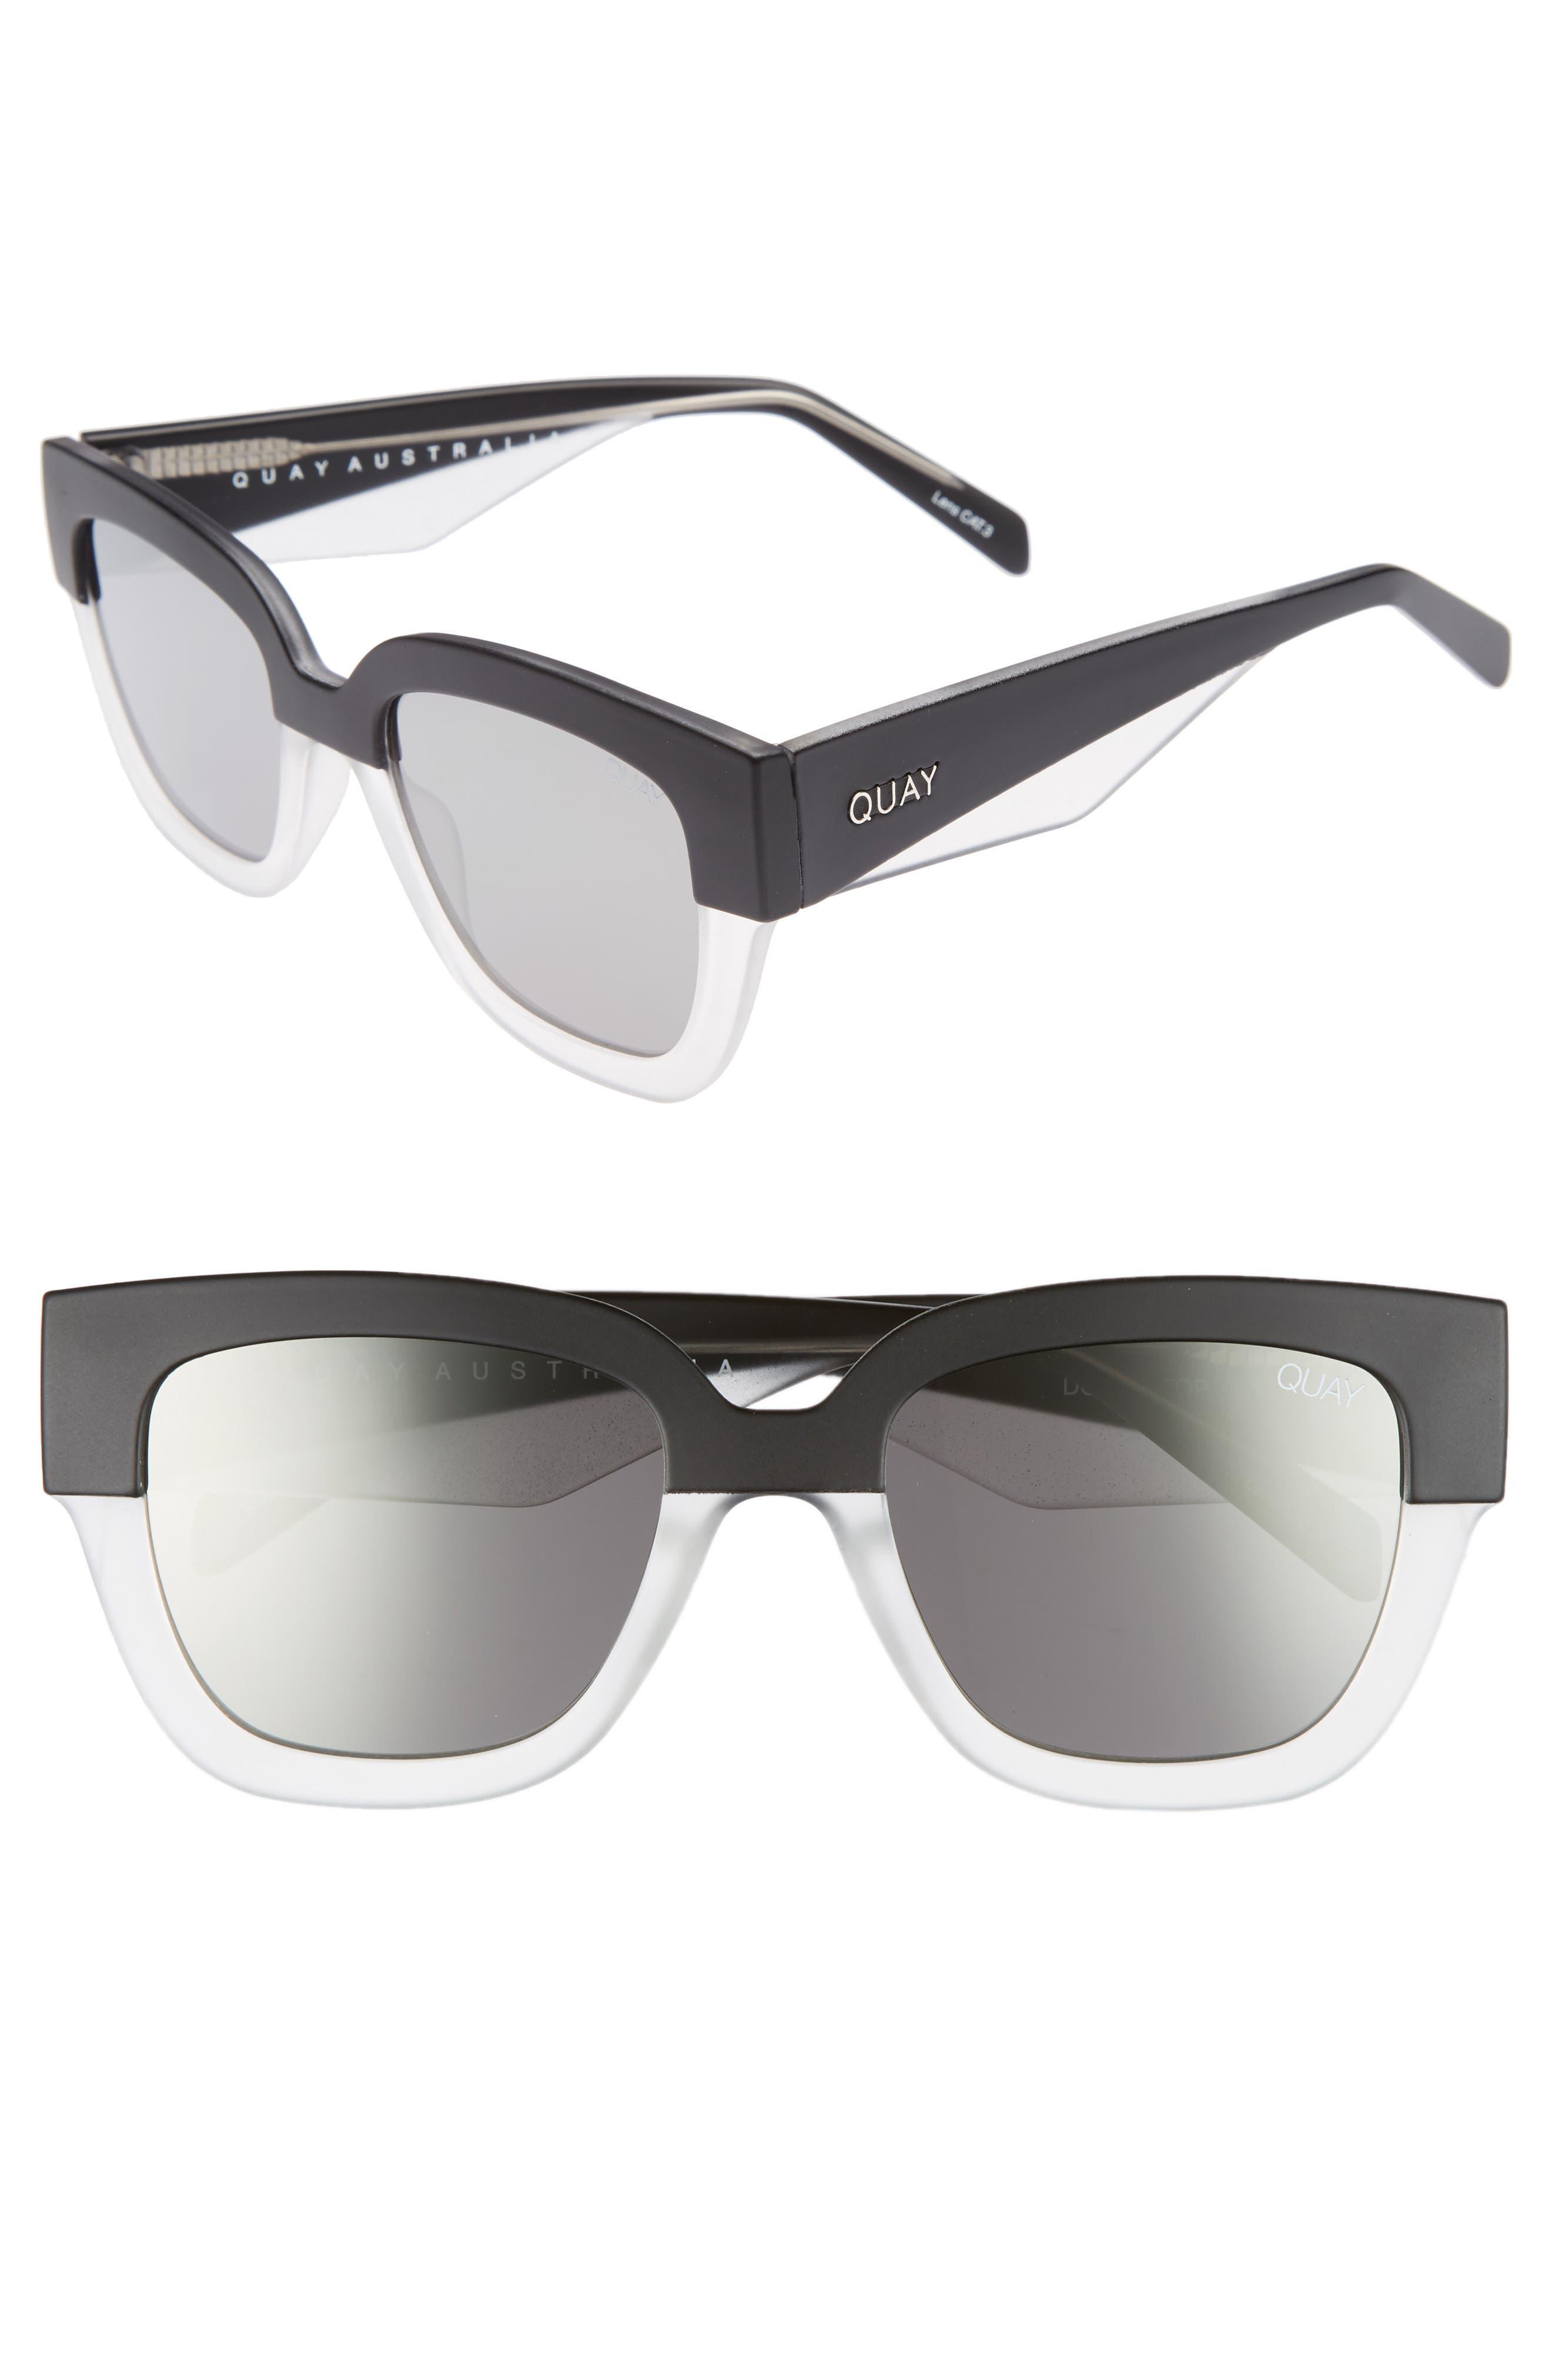 55mm Don't Stop Sunglasses,                         Main,                         color,